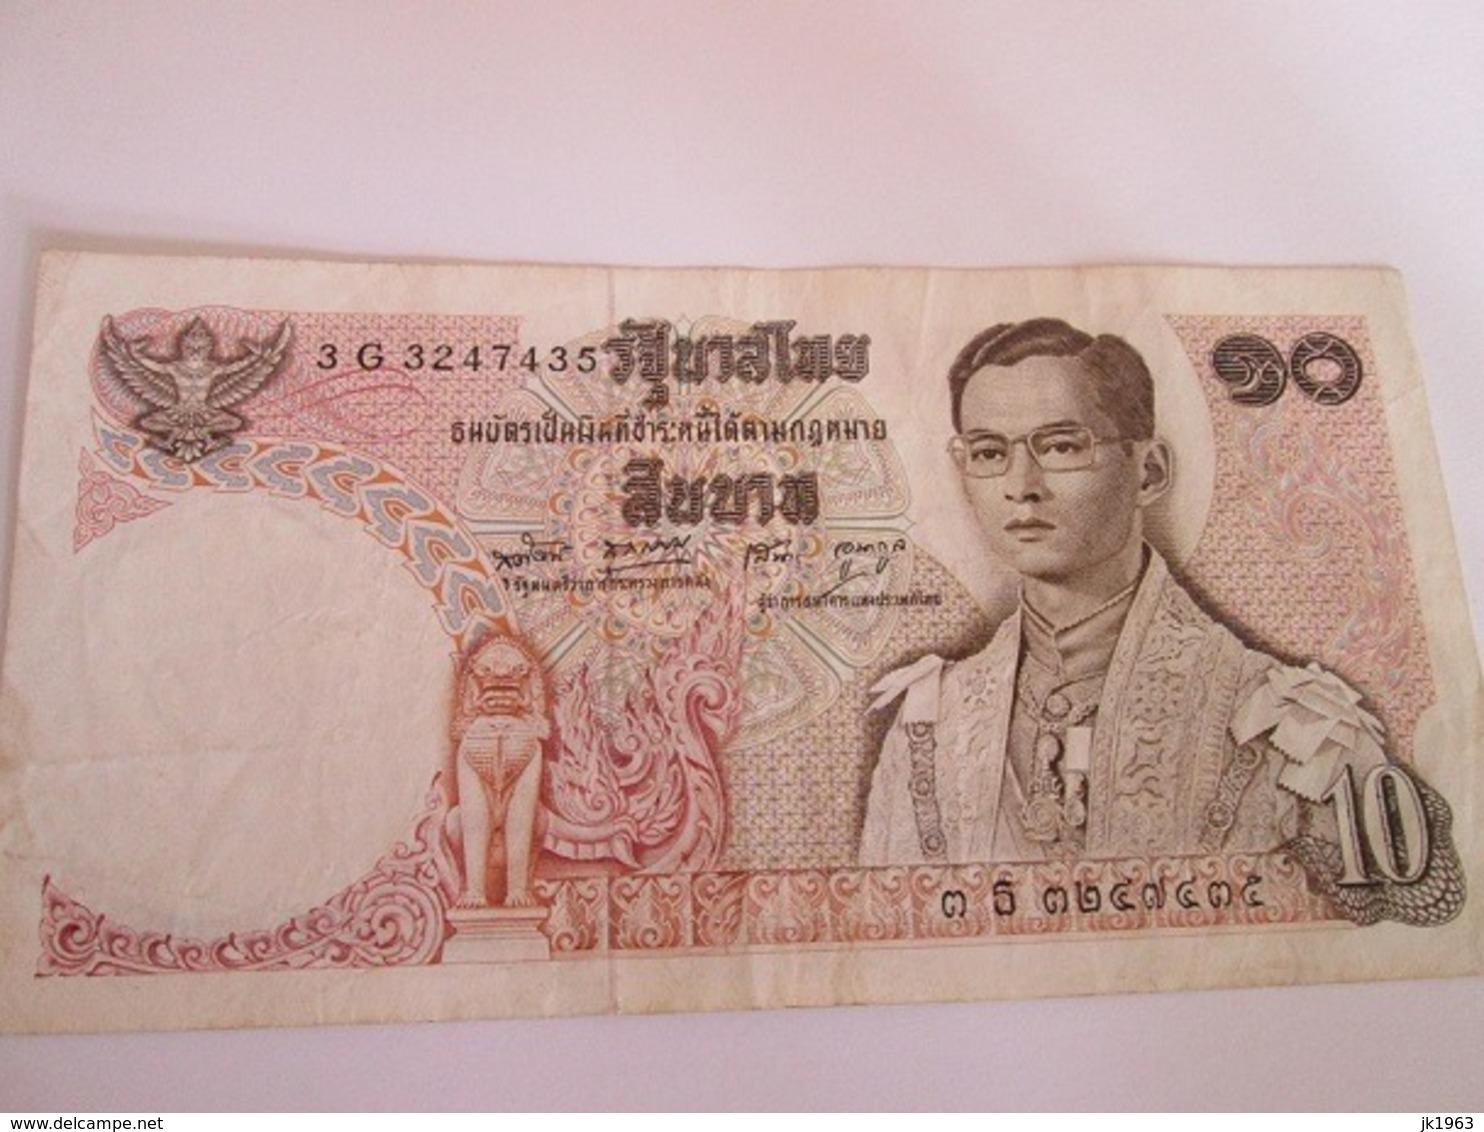 THAILAND 10 BAHT, 1969'1978 - Thailand